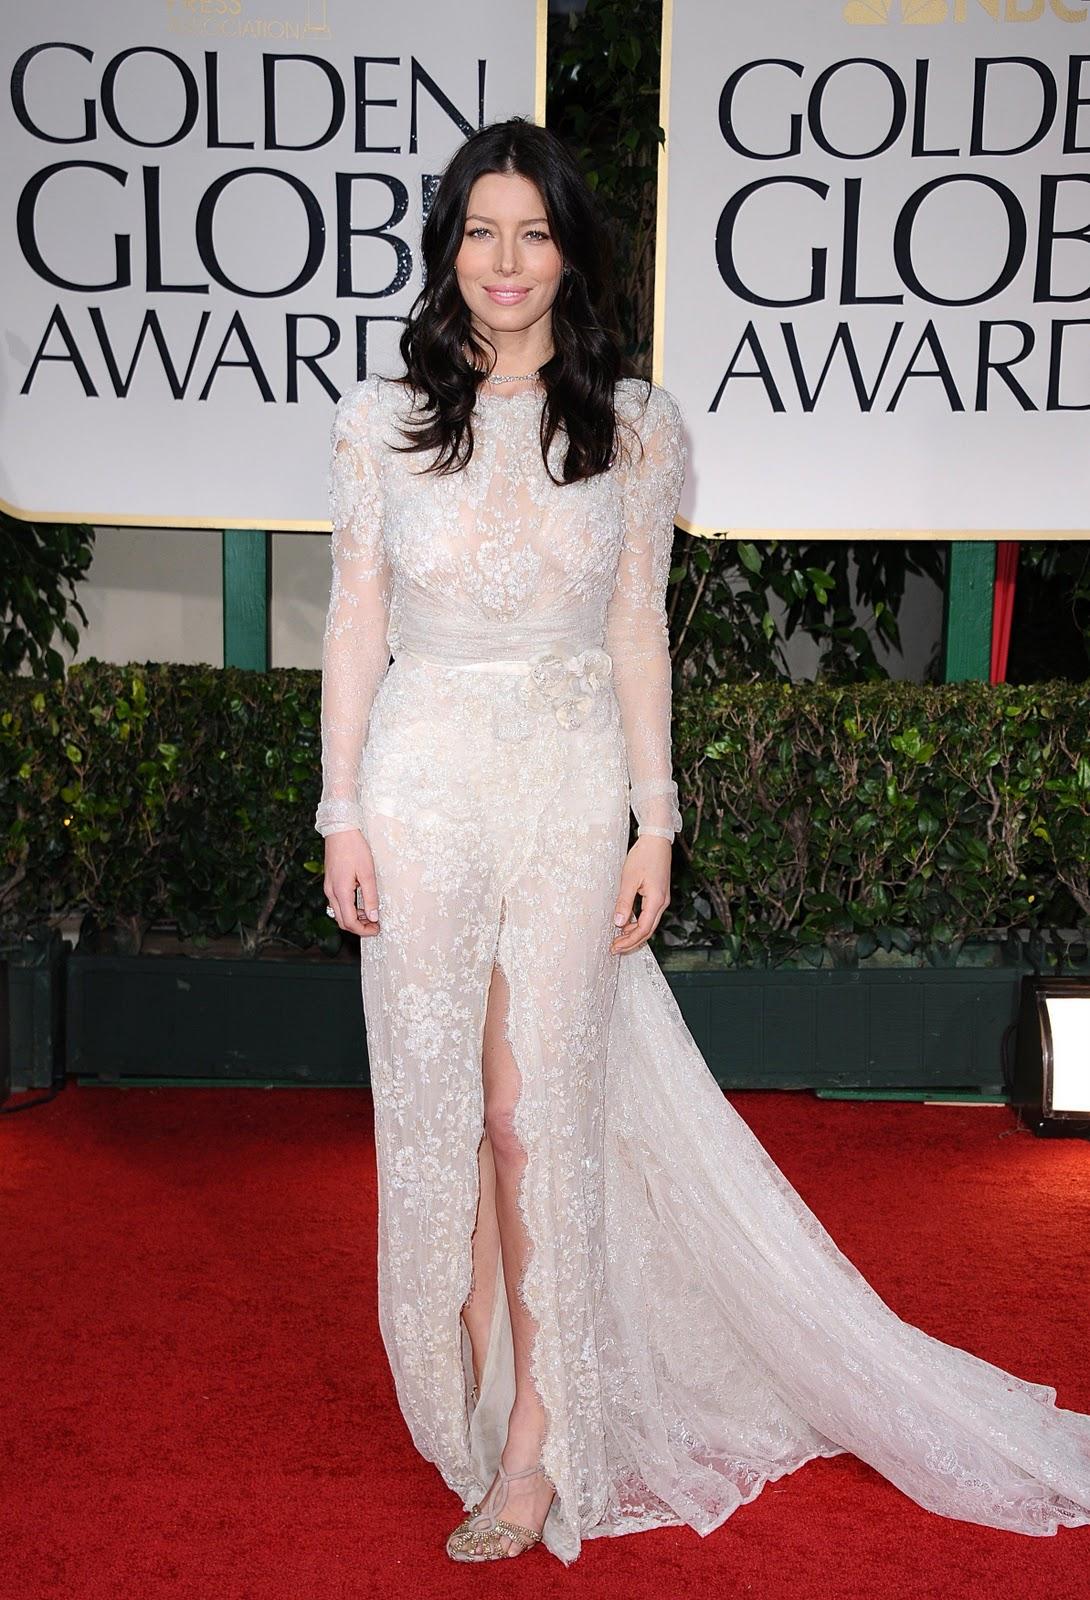 http://4.bp.blogspot.com/-yLEt3c7CjyM/TxN2vkf-xPI/AAAAAAAABpo/AD5Z5a9vLHk/s1600/CU-Jessica+Biel+arrives+at+the+69th+Annual+Golden+Globe+Awards-01.jpg